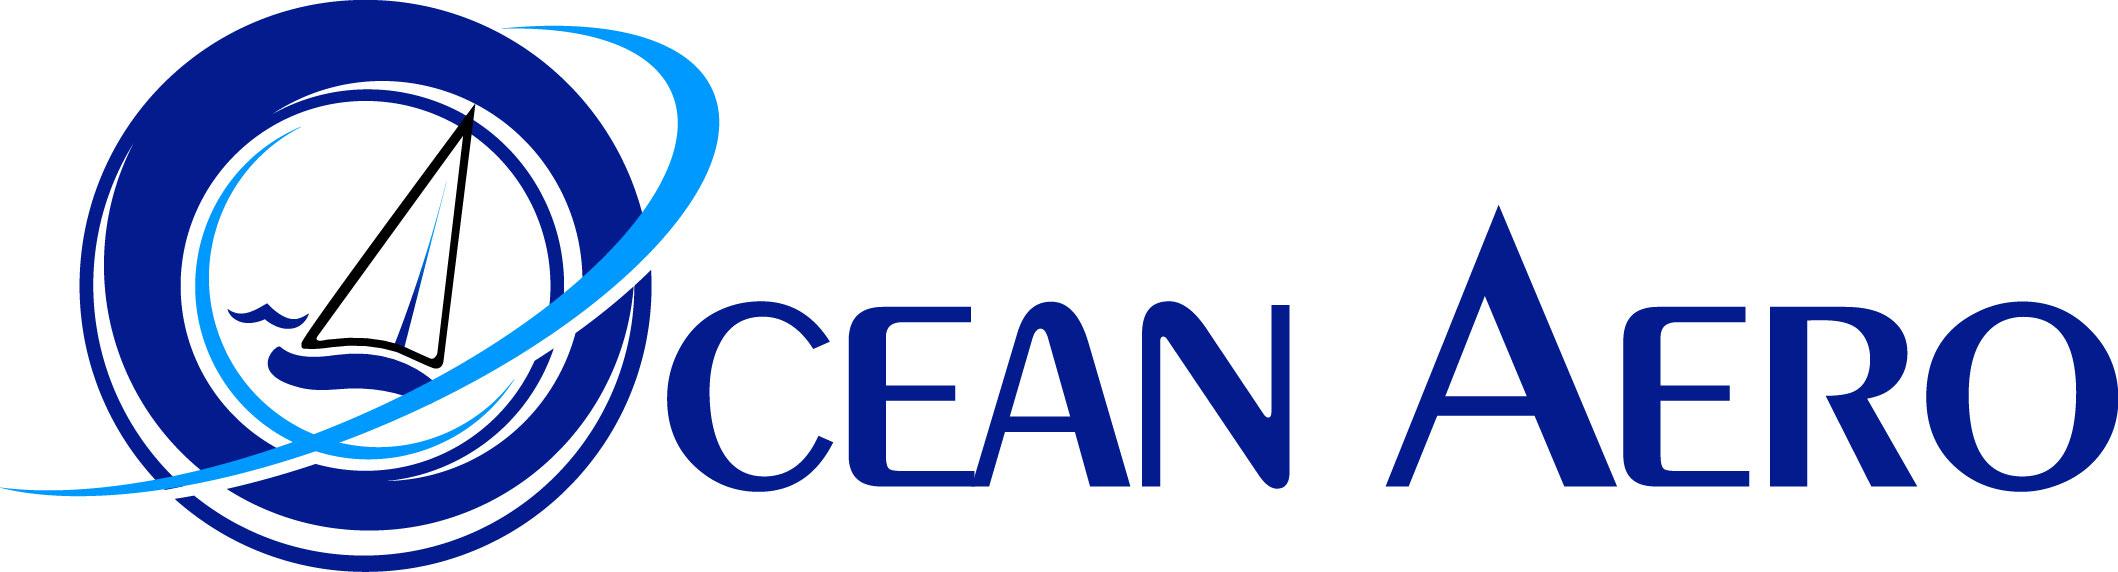 Made-in-California-Manufacturer-Ocean-Aero-Logo